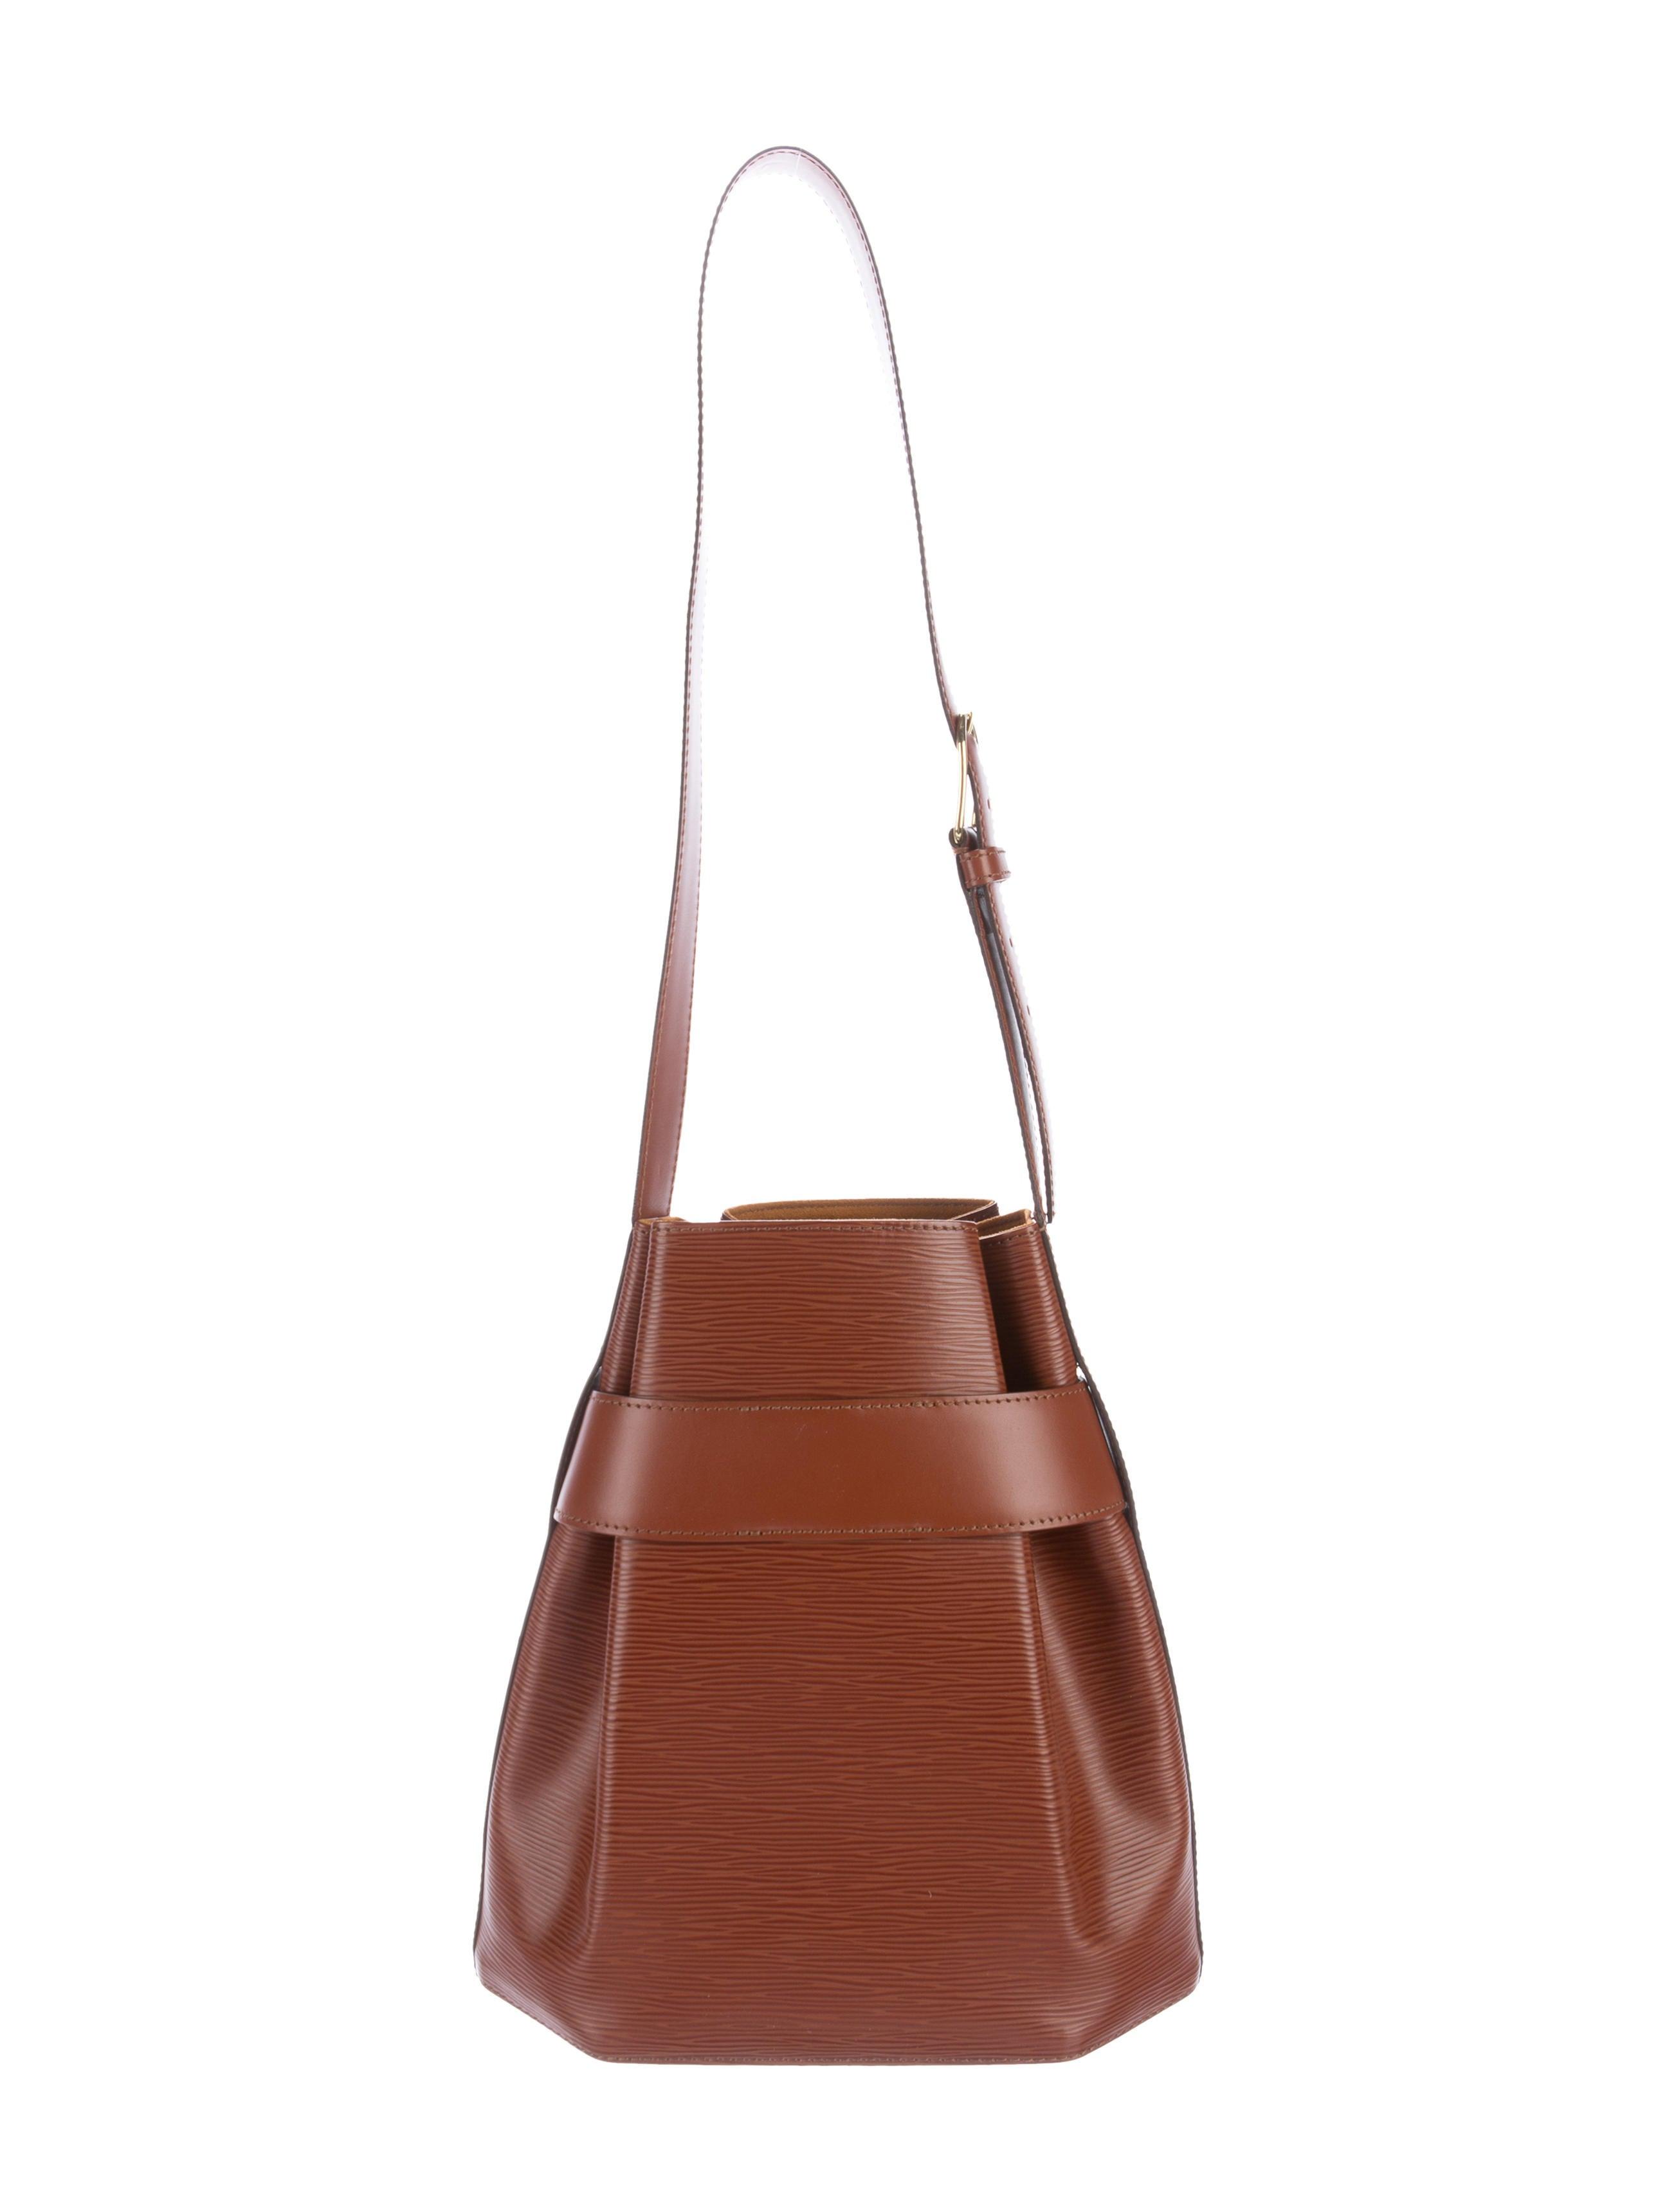 Sac Louis Vuitton Matelassé : Louis vuitton epi sac d epaule pm handbags lou